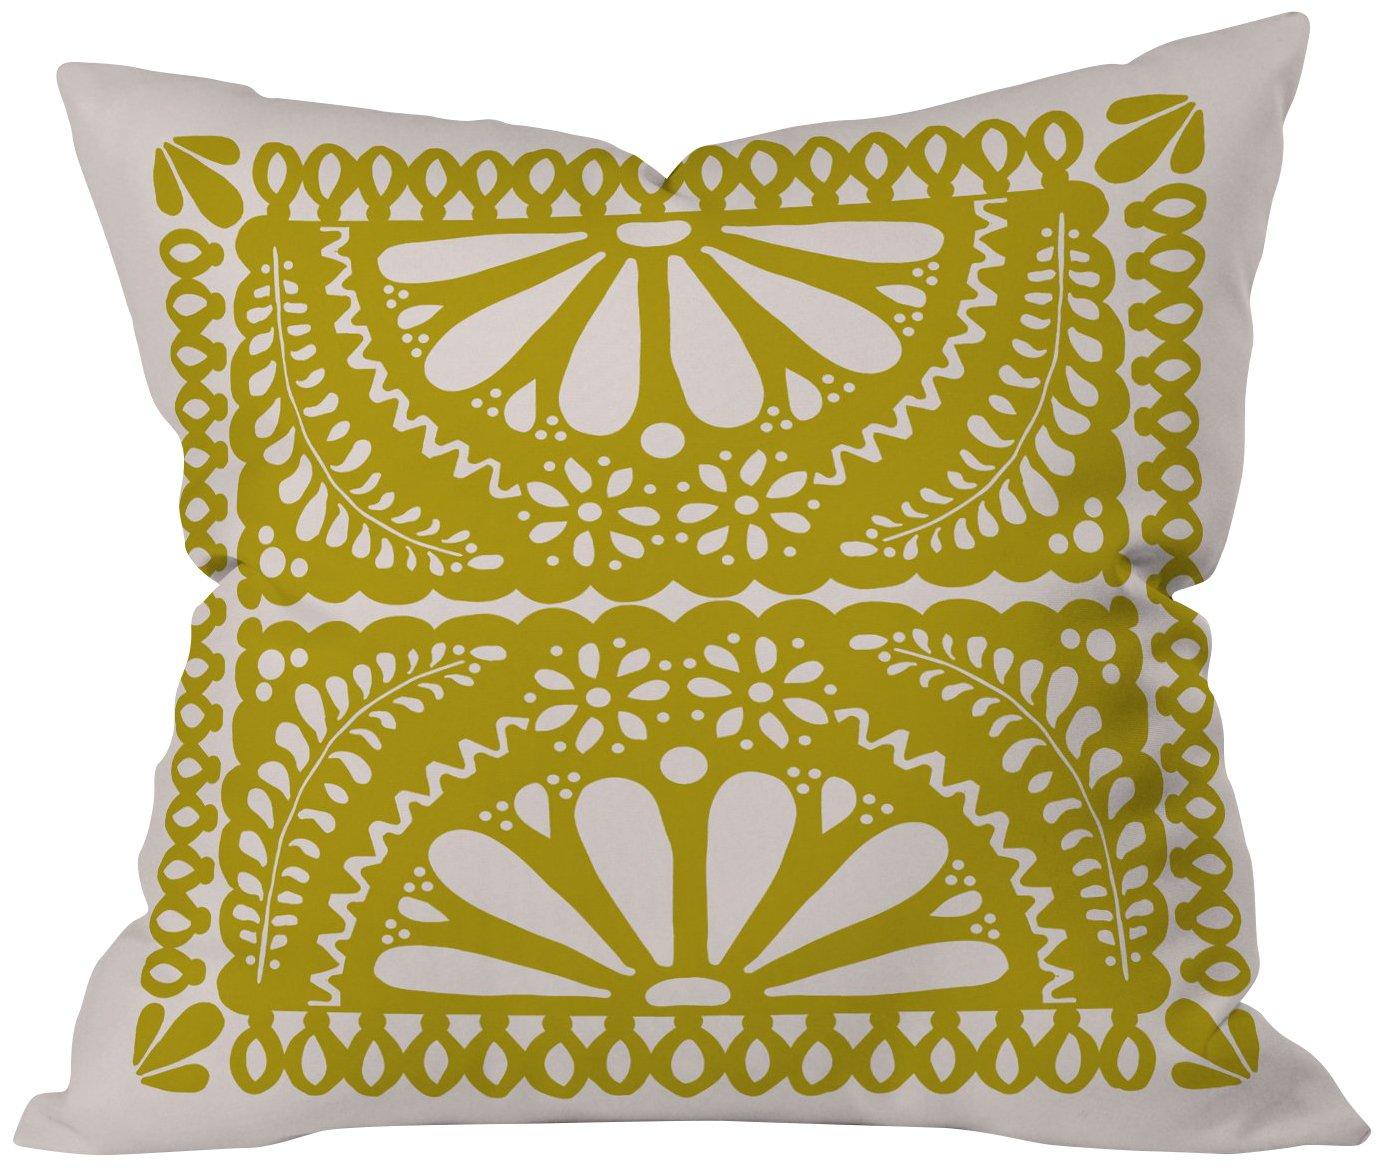 20 x 20 Deny Designs Natalie Baca Fiesta De Flores In Olive Throw Pillow